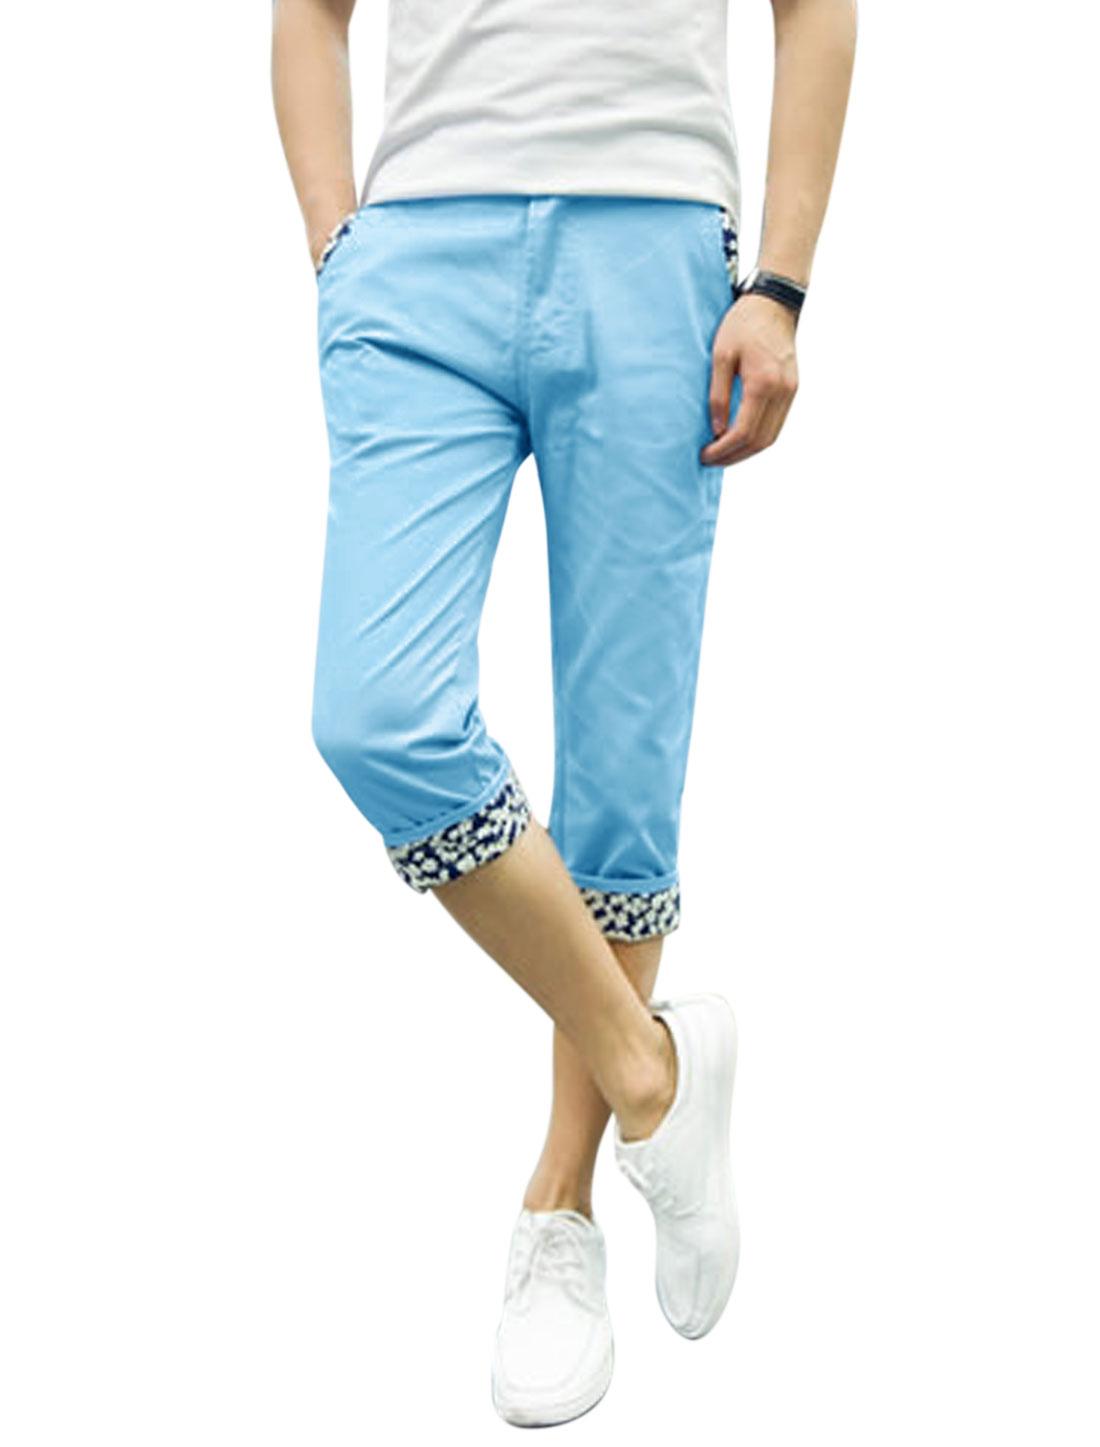 Men Mid Waist Zip Fly Pockets Leisure Capris Pants Sky Blue W32